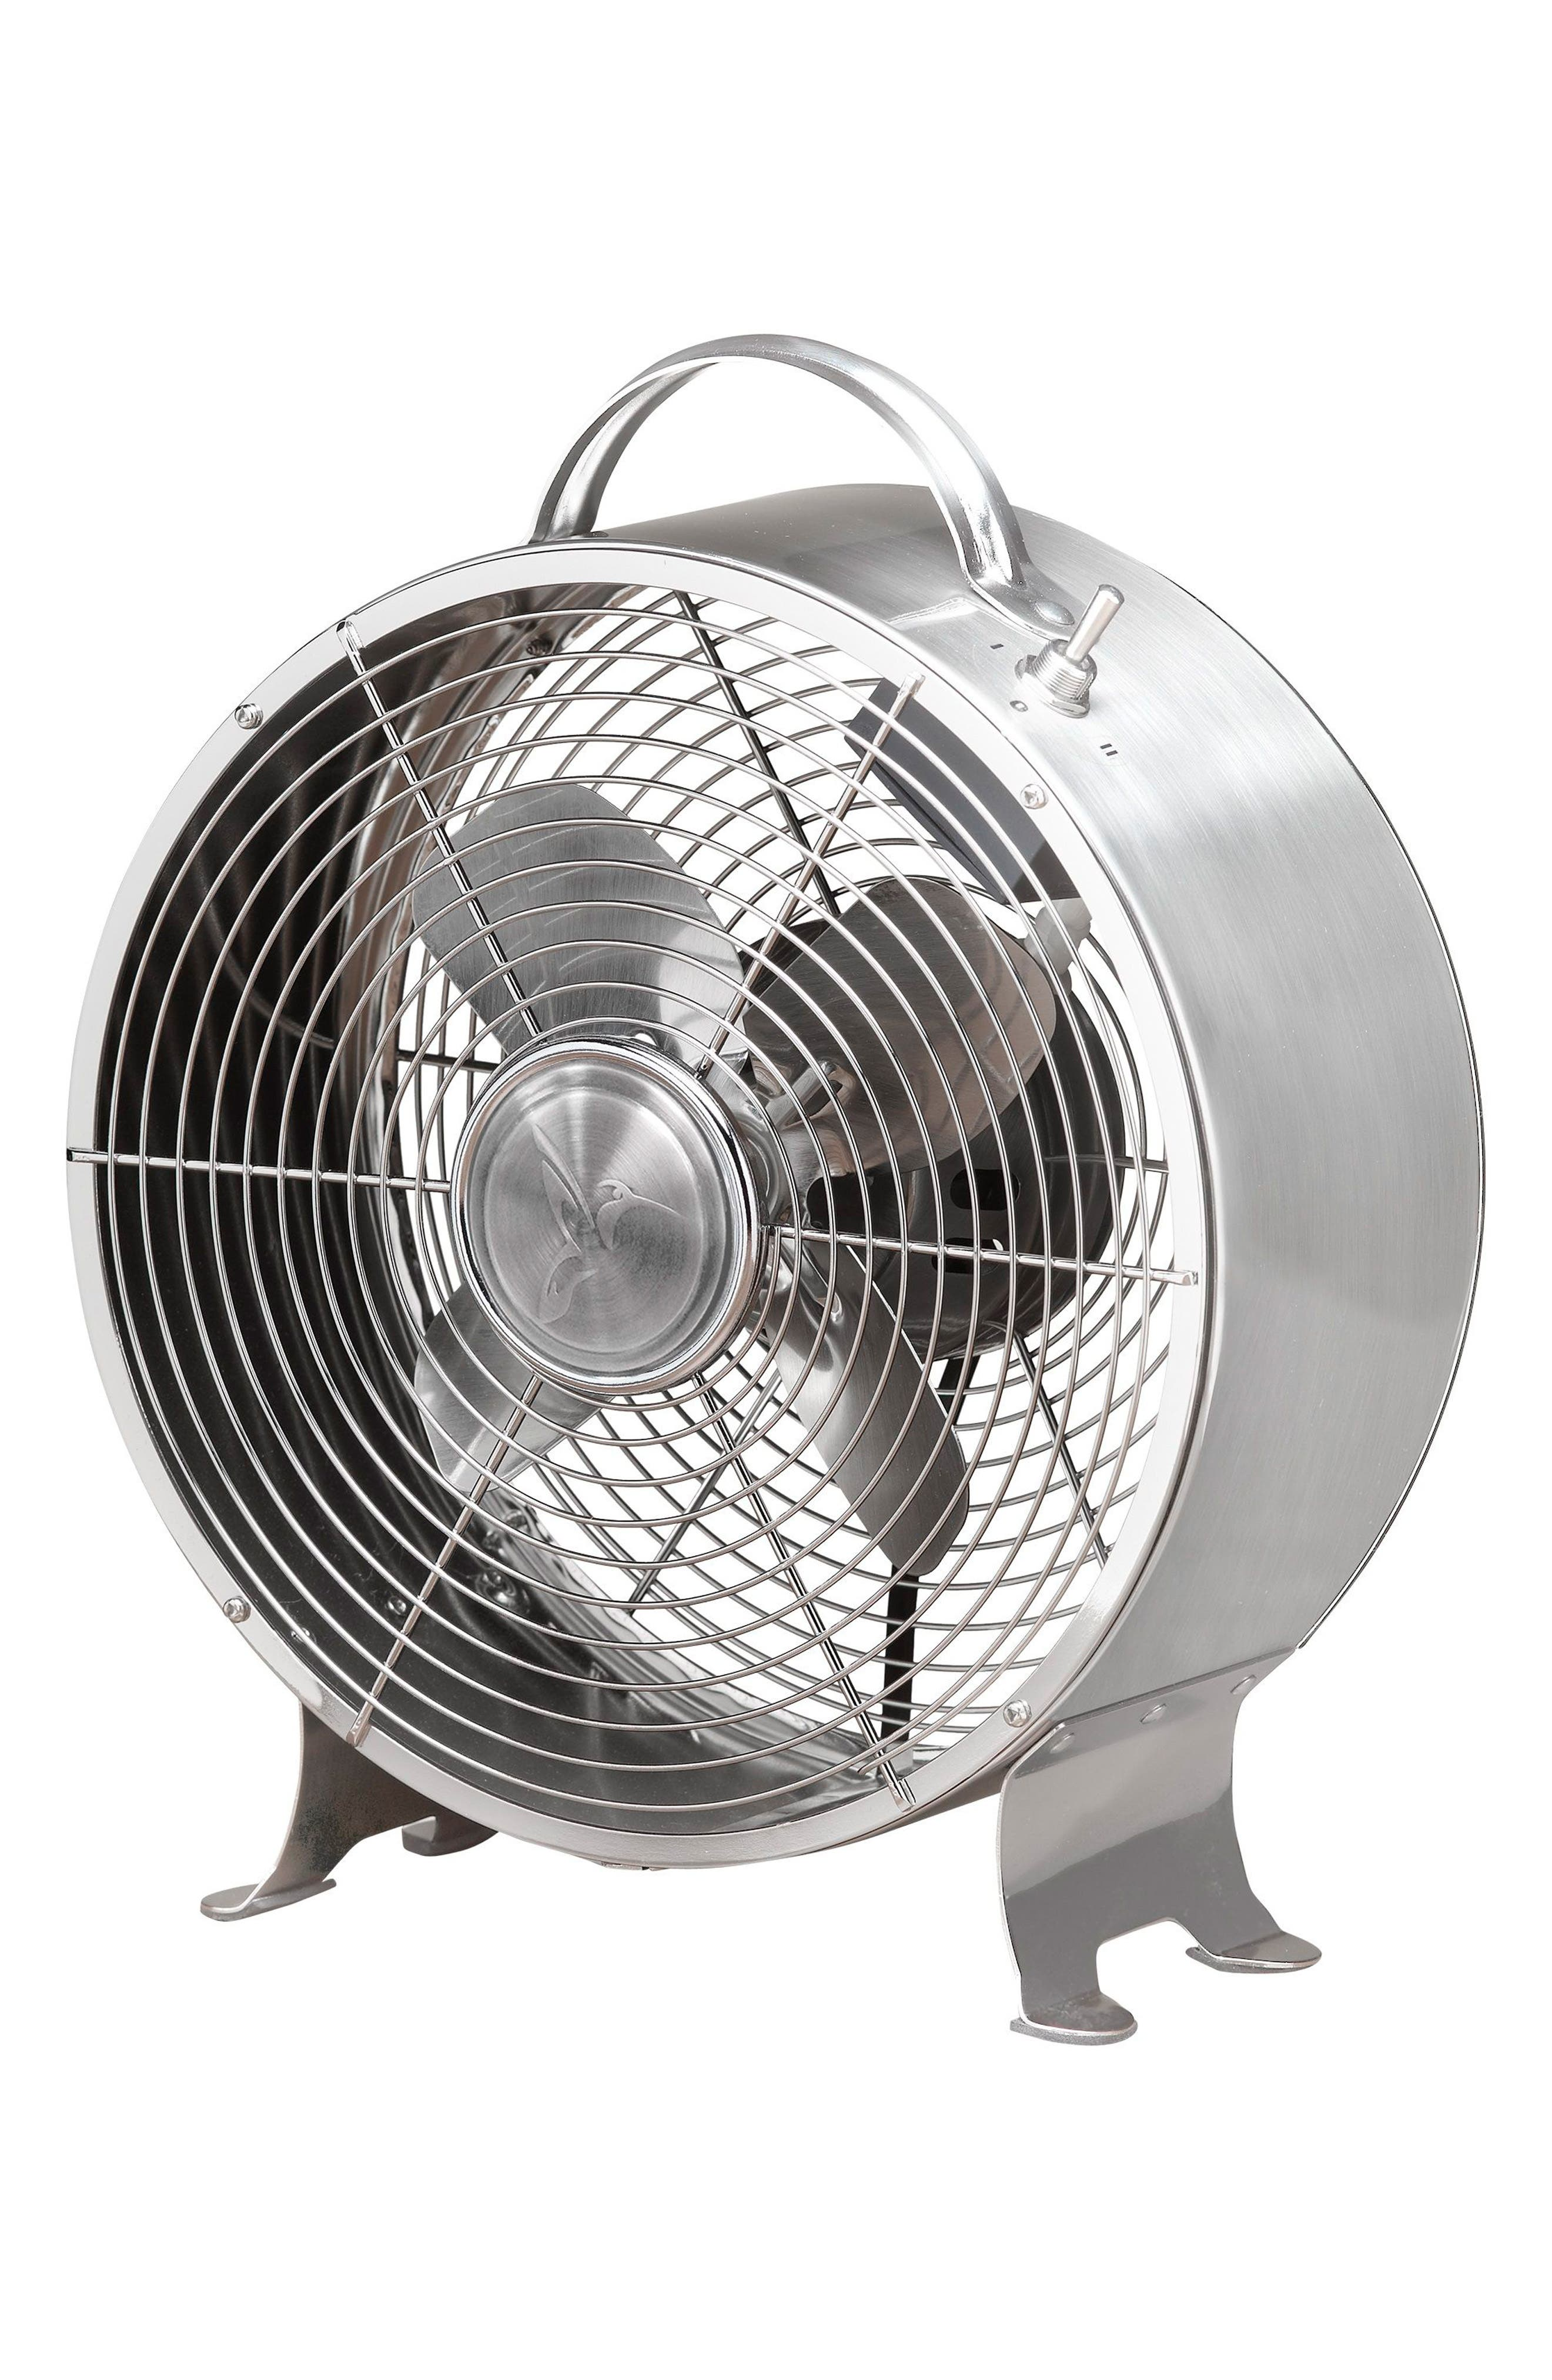 Main Image - DecoBREEZE Retro Metal Fan